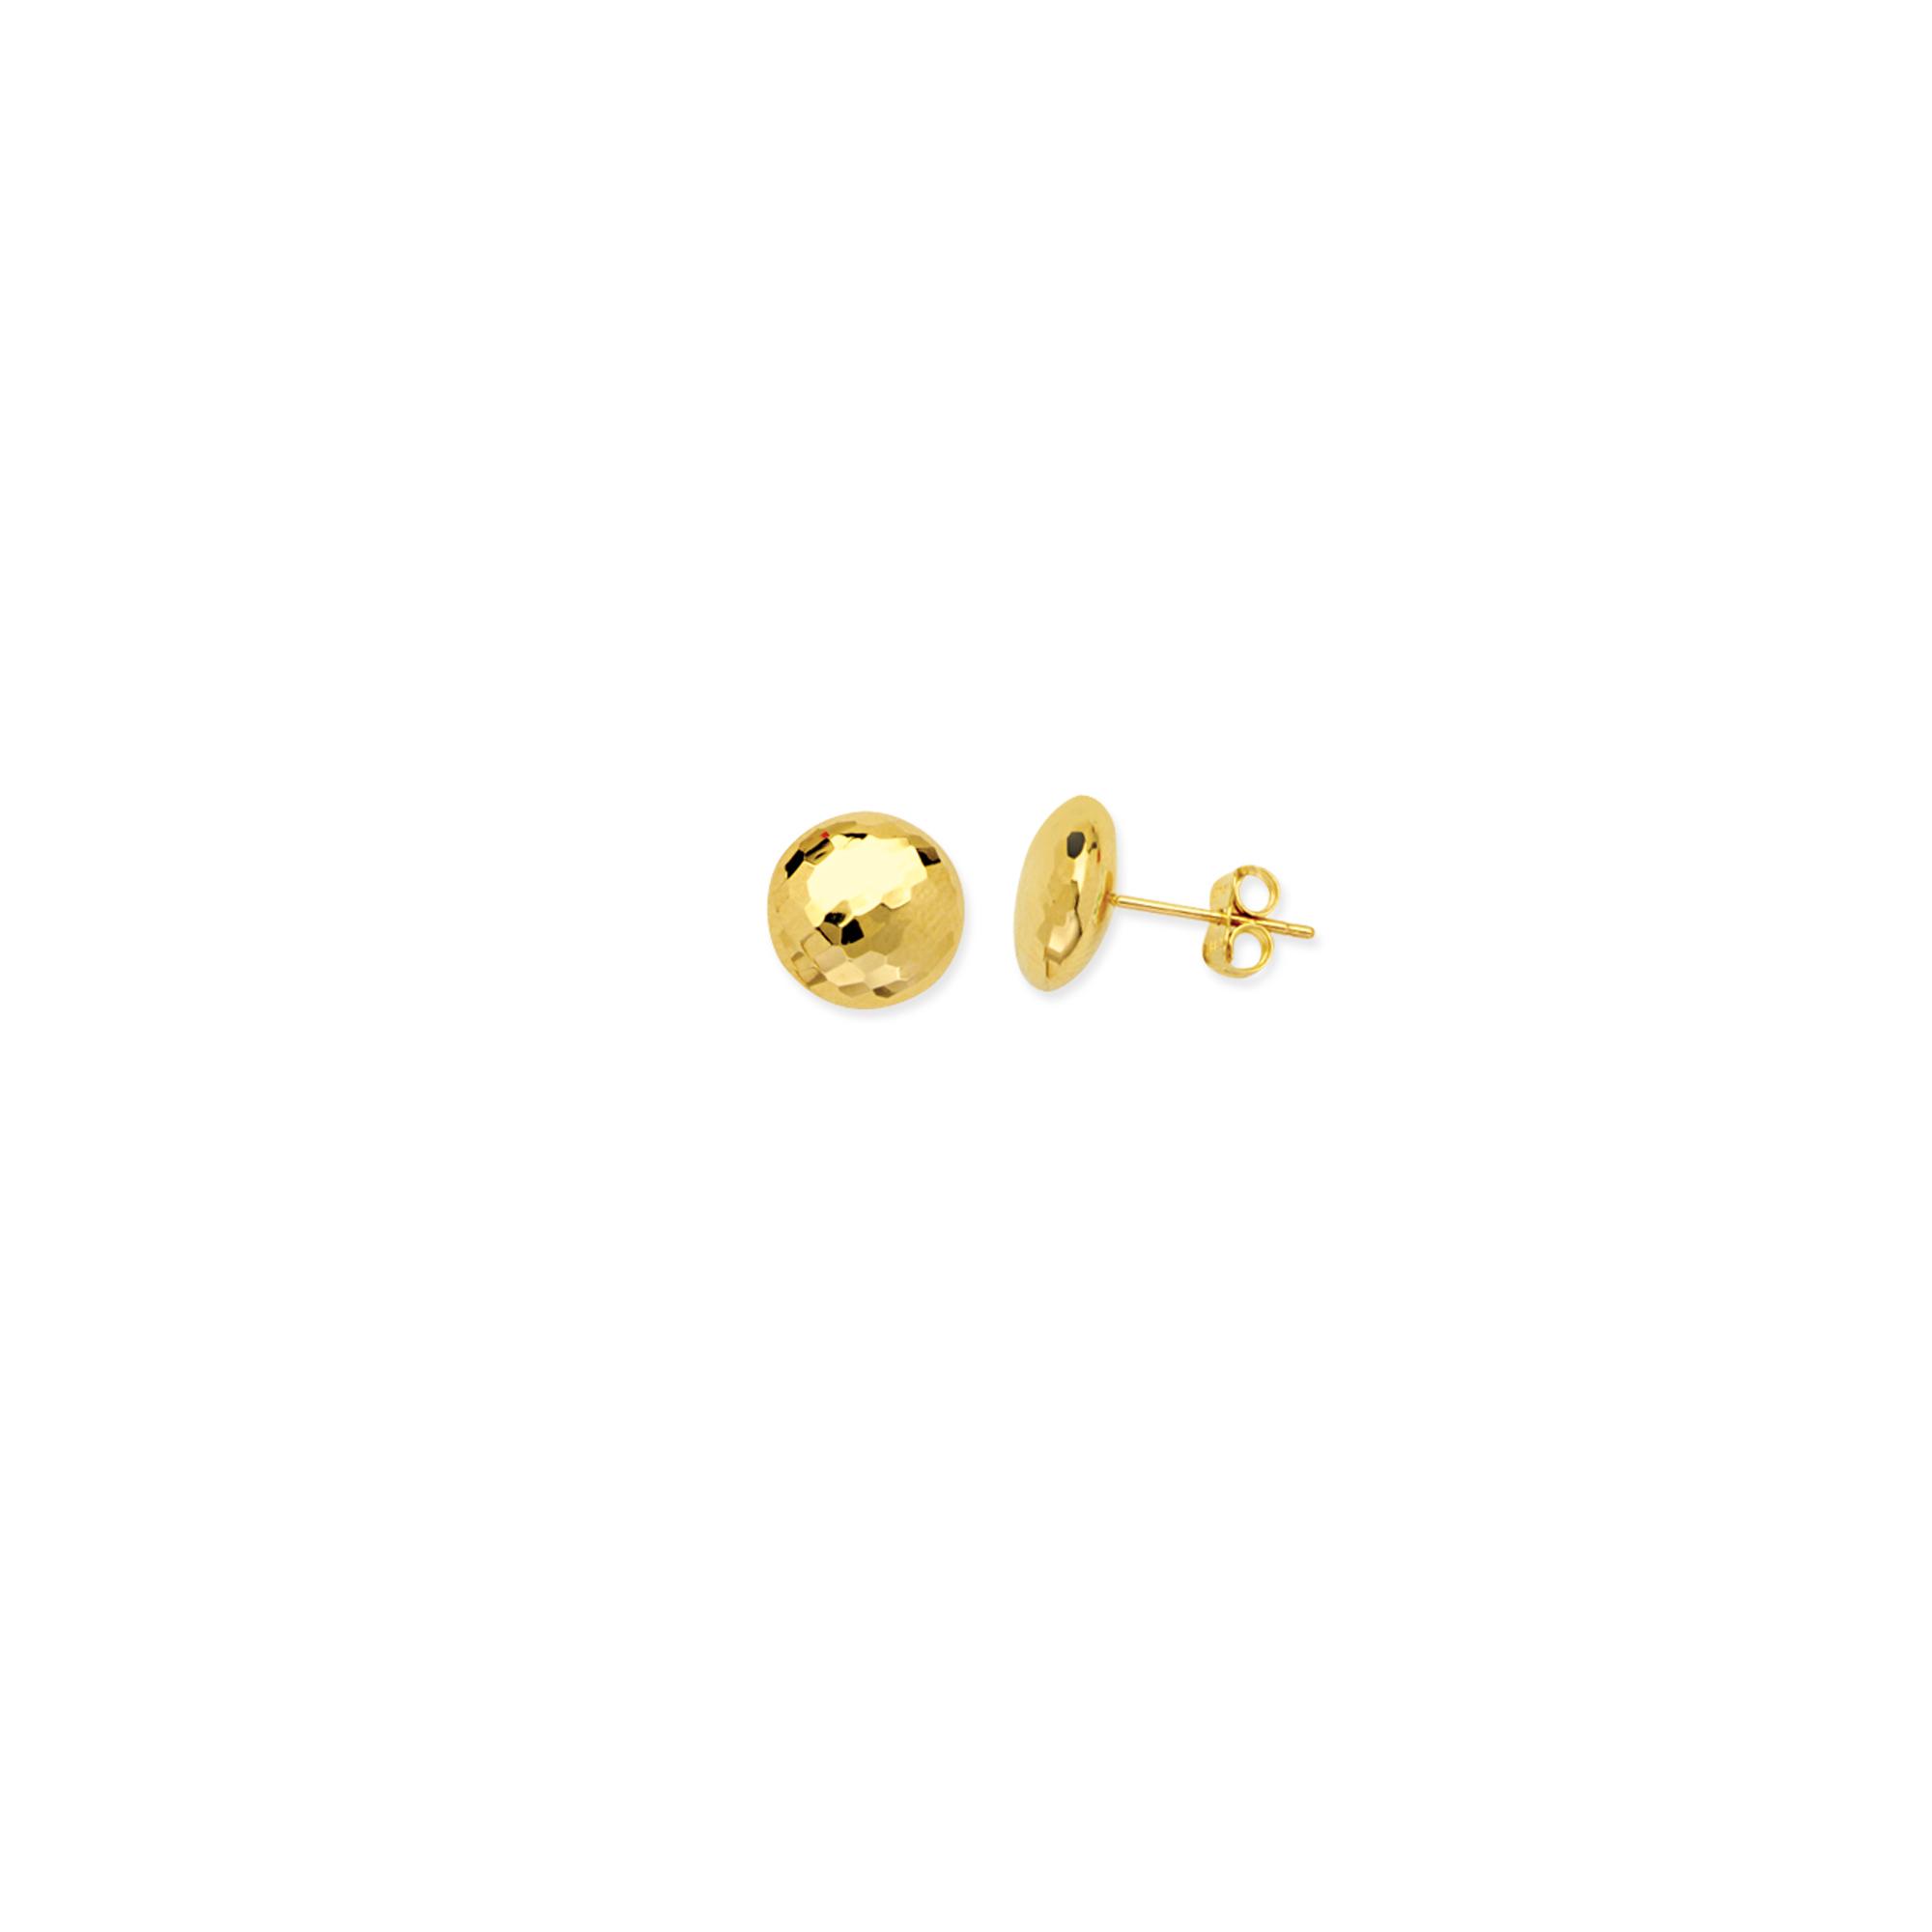 Button Earrings,  14Kt Gold  Button Earring